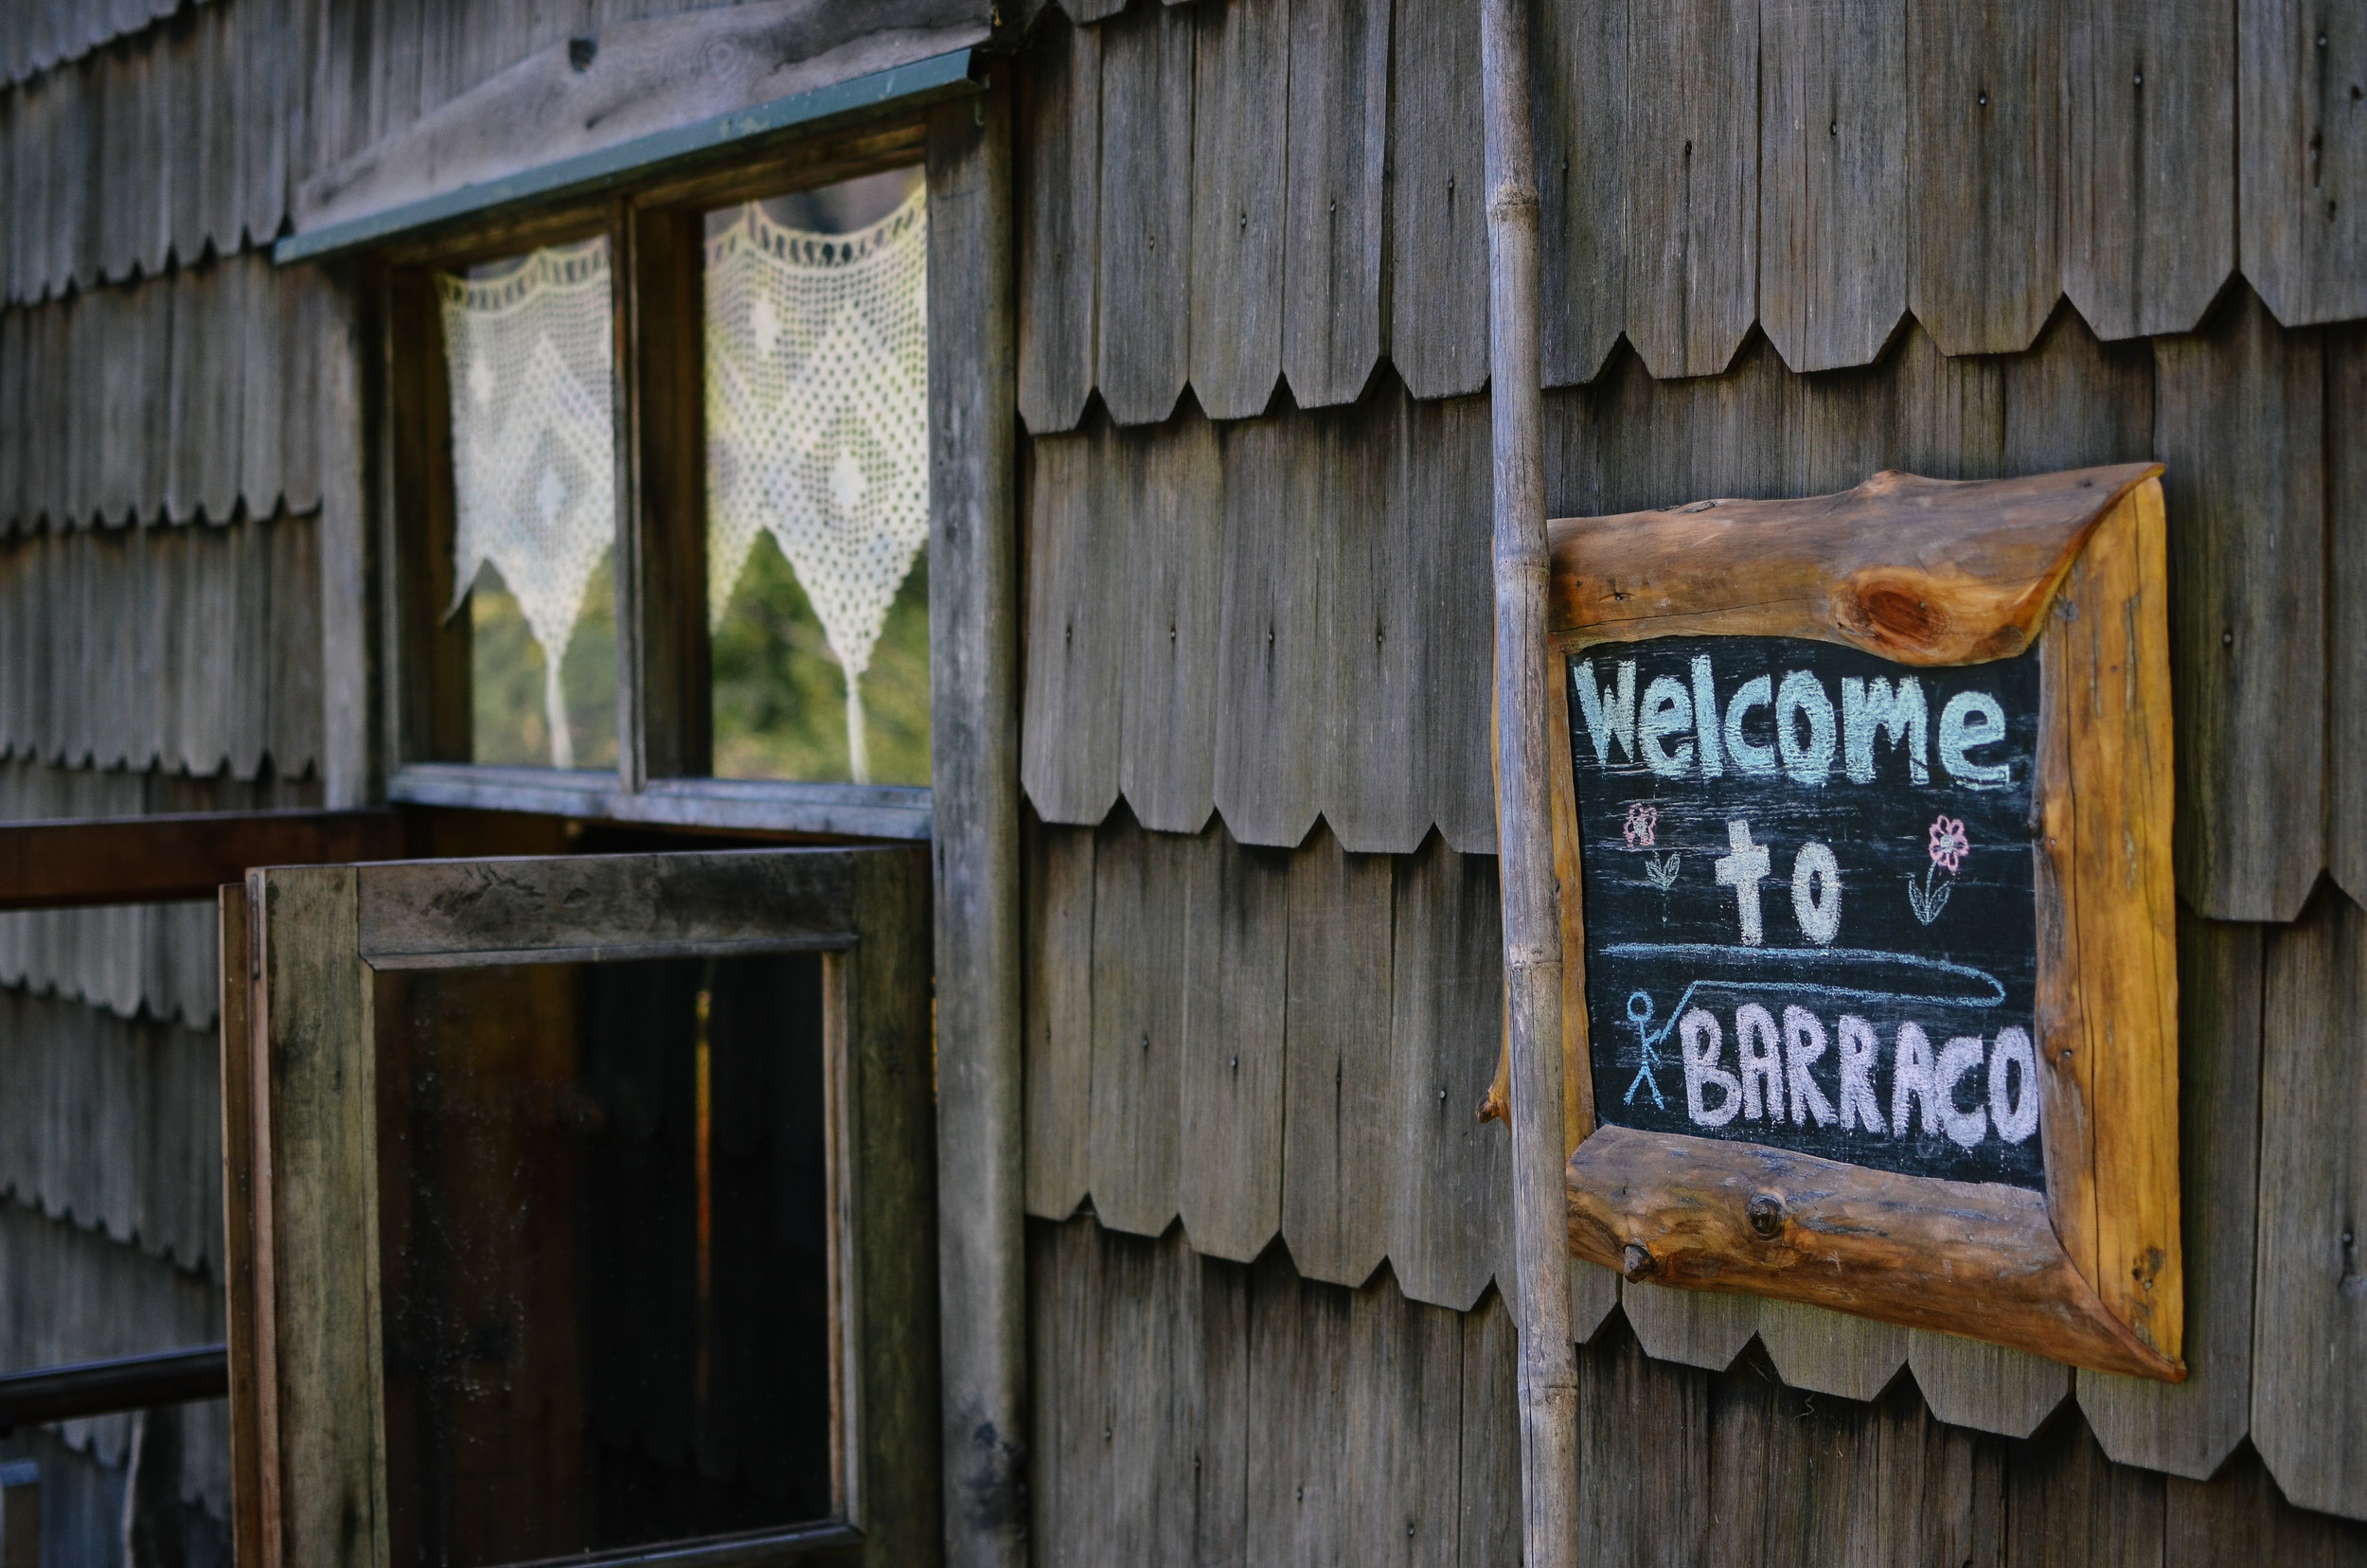 barraco+lodge+chile+life+on+pine+travel+blog+life+on+pine_DSC_1283.jpg